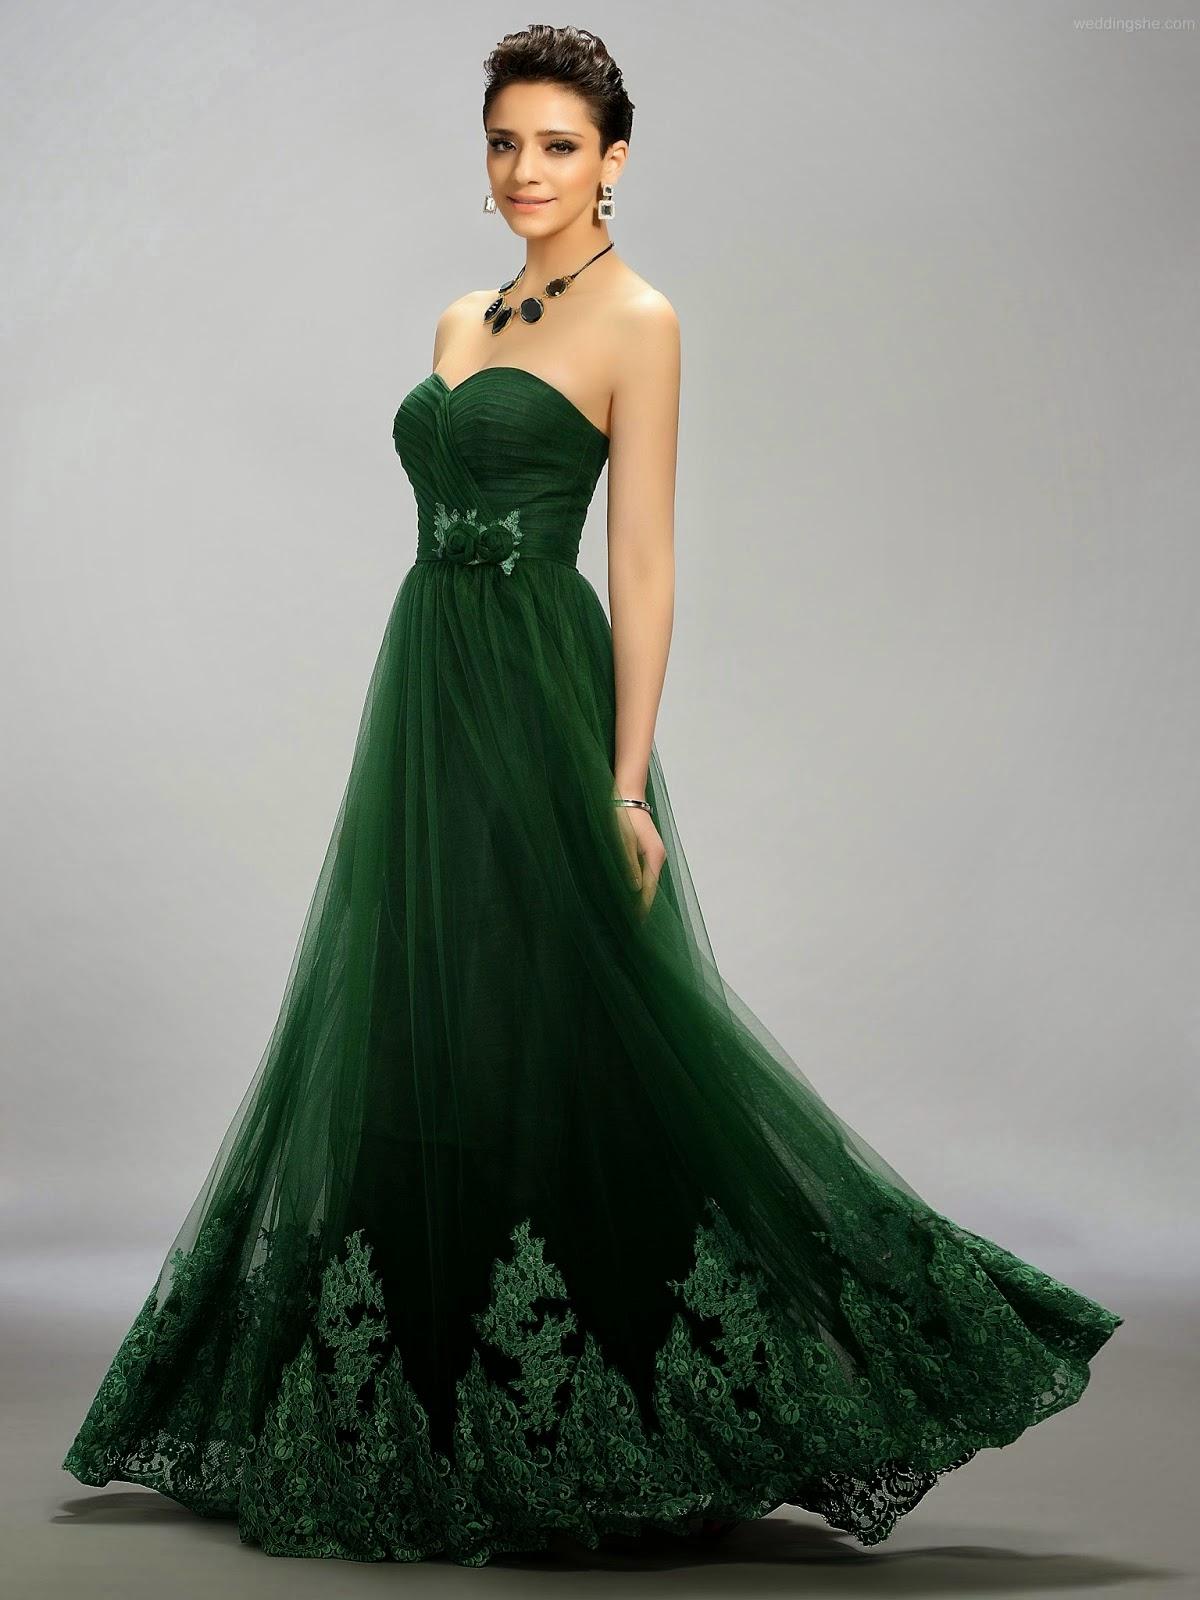 evgen fashion blog: plaid evening dress